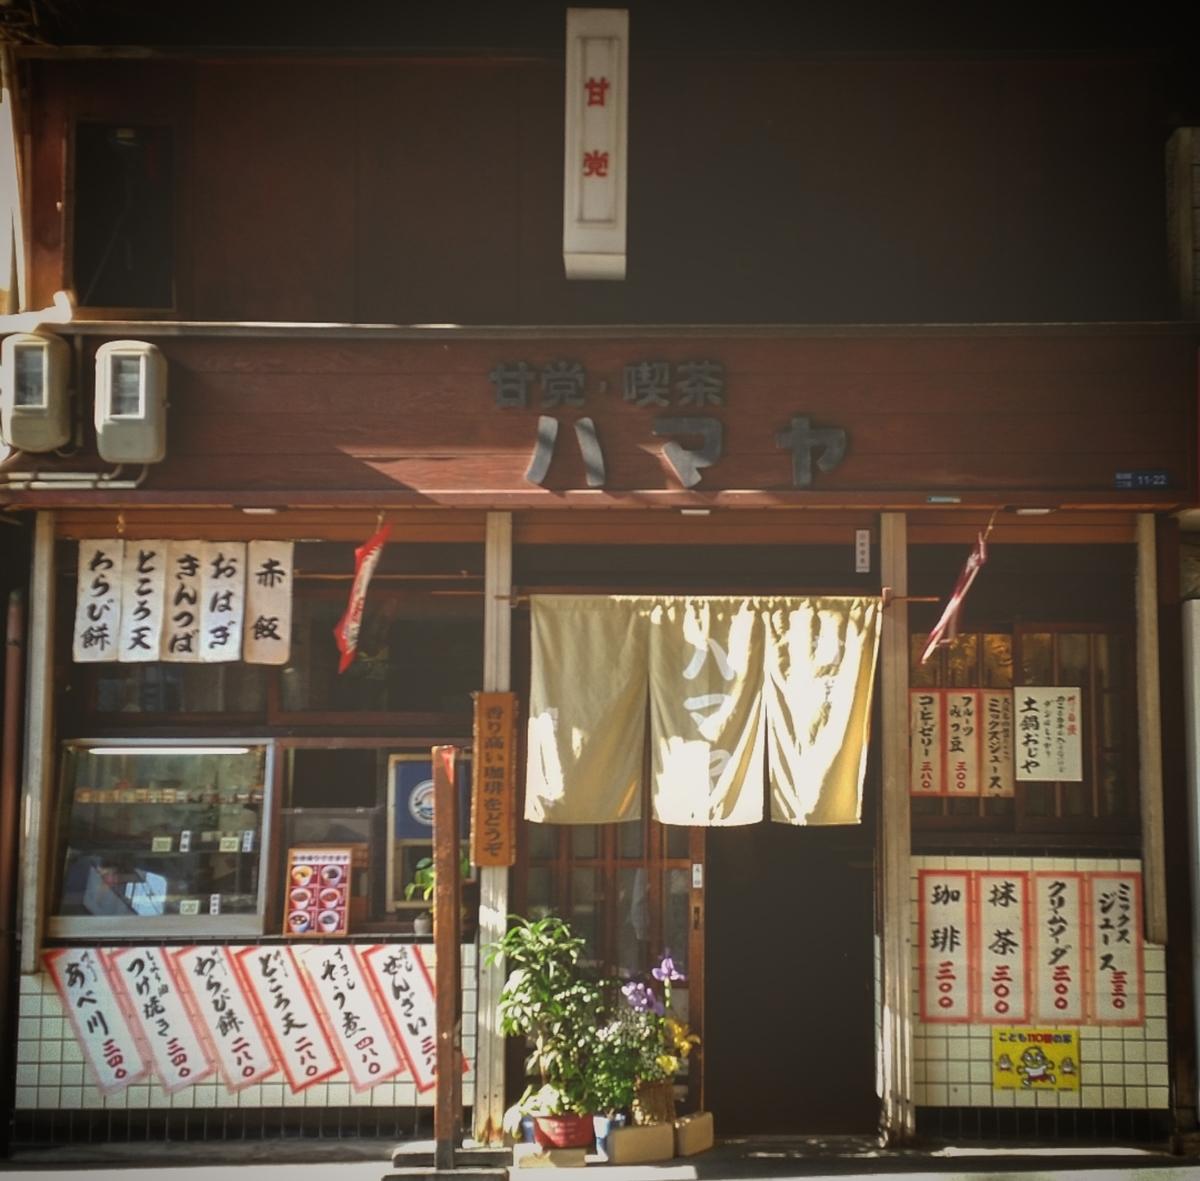 f:id:ichigo-ichie411211:20190512110526j:plain